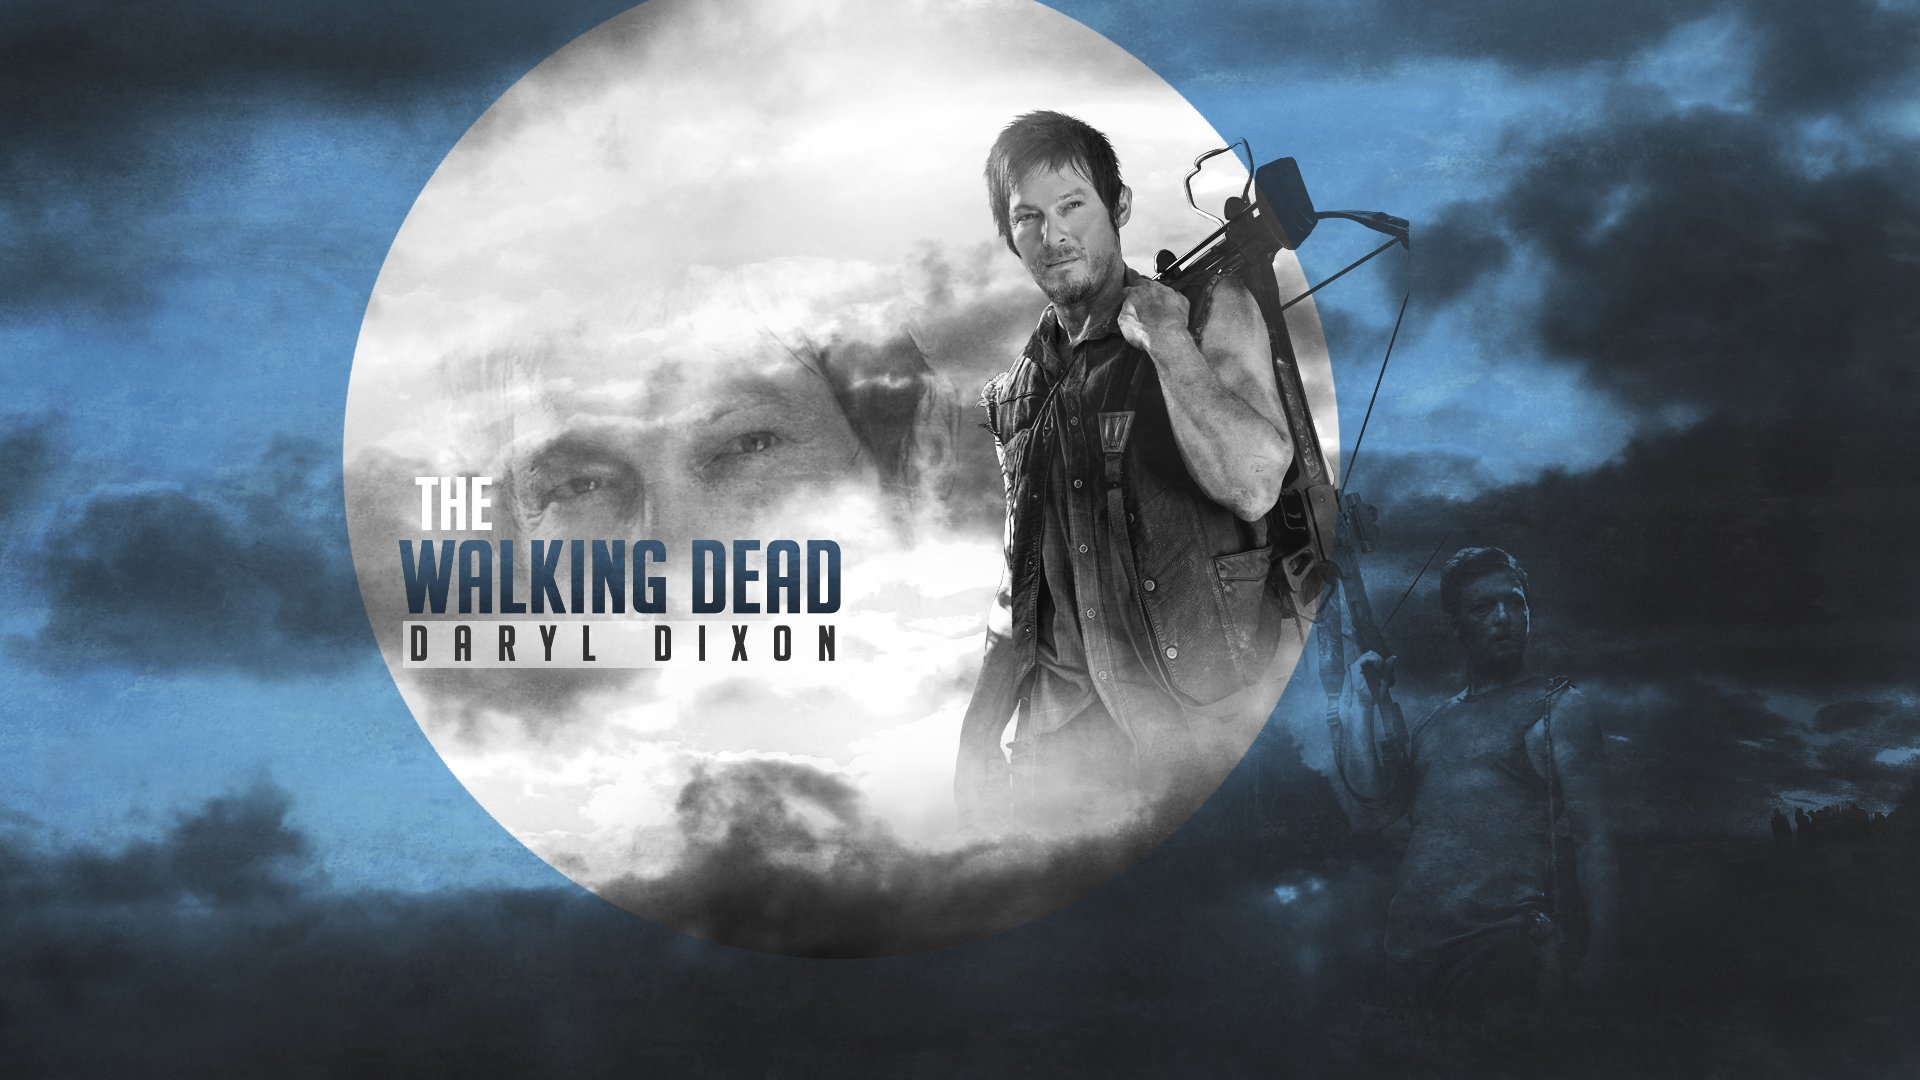 Daryl Dixon (TWD) Fondo De Pantalla HD